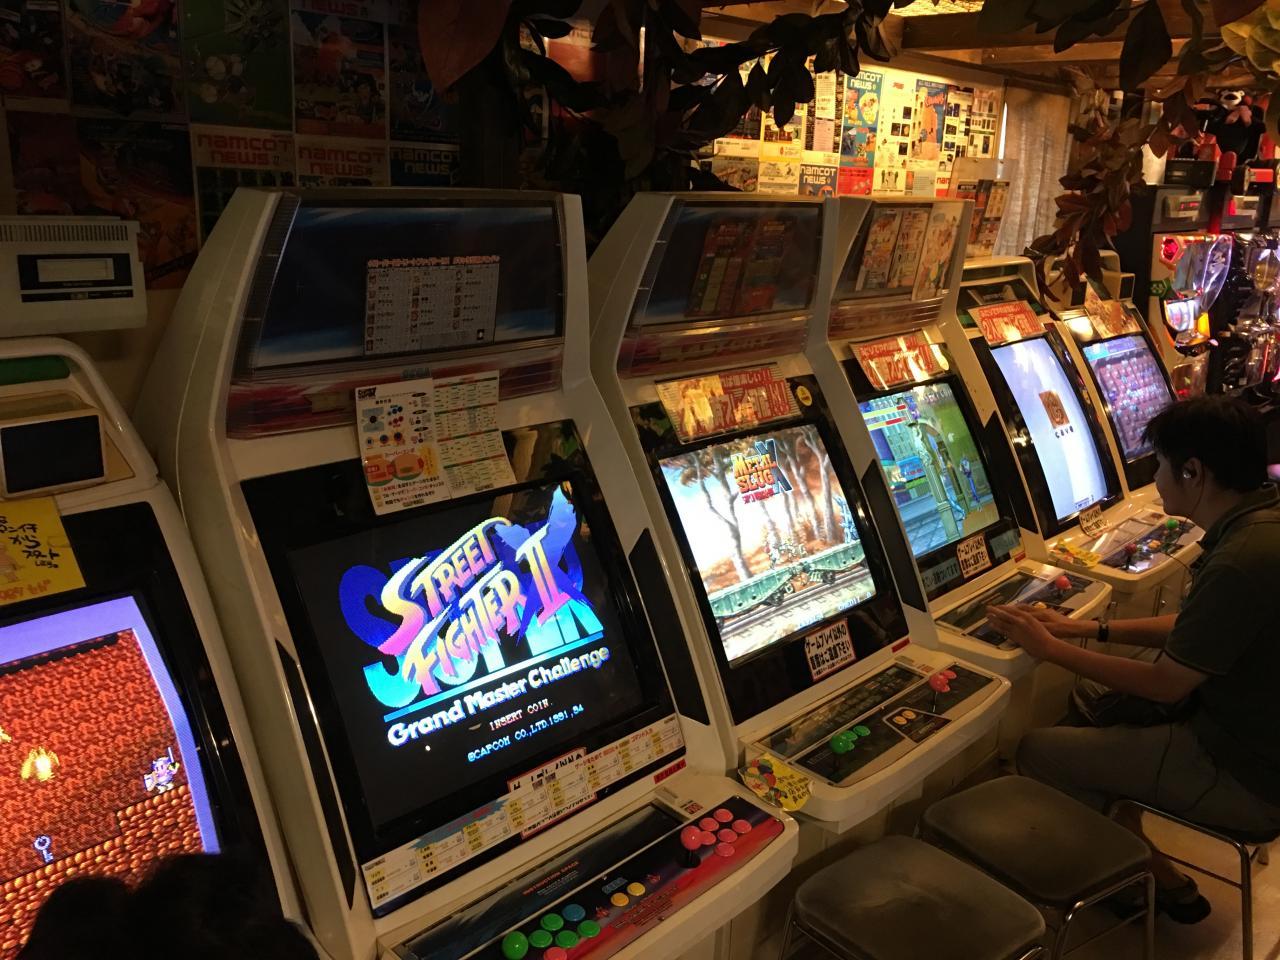 160911_28827_arcade_retro_2_1280_960.JPG